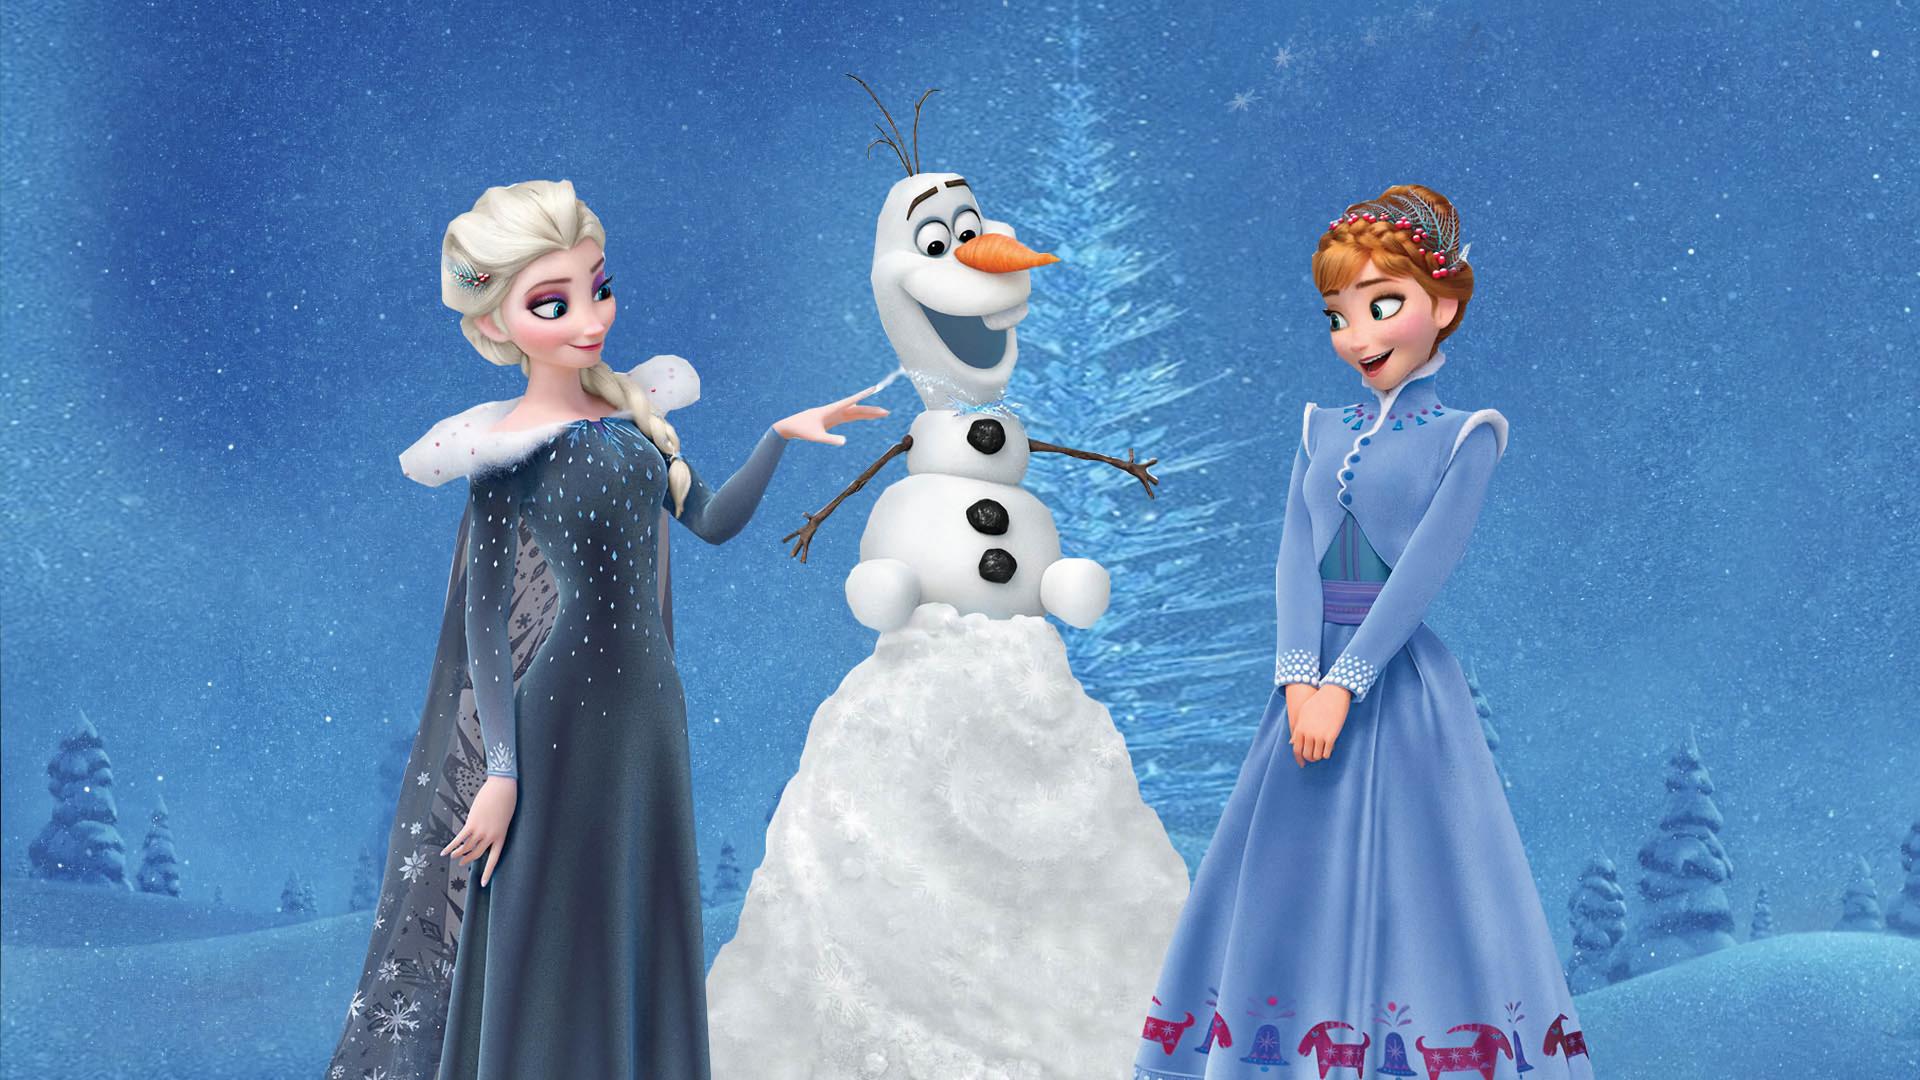 Olaf 39 s frozen adventure hd wallpaper background image 1920x1080 id 908922 wallpaper abyss - Olaf s frozen adventure download ...